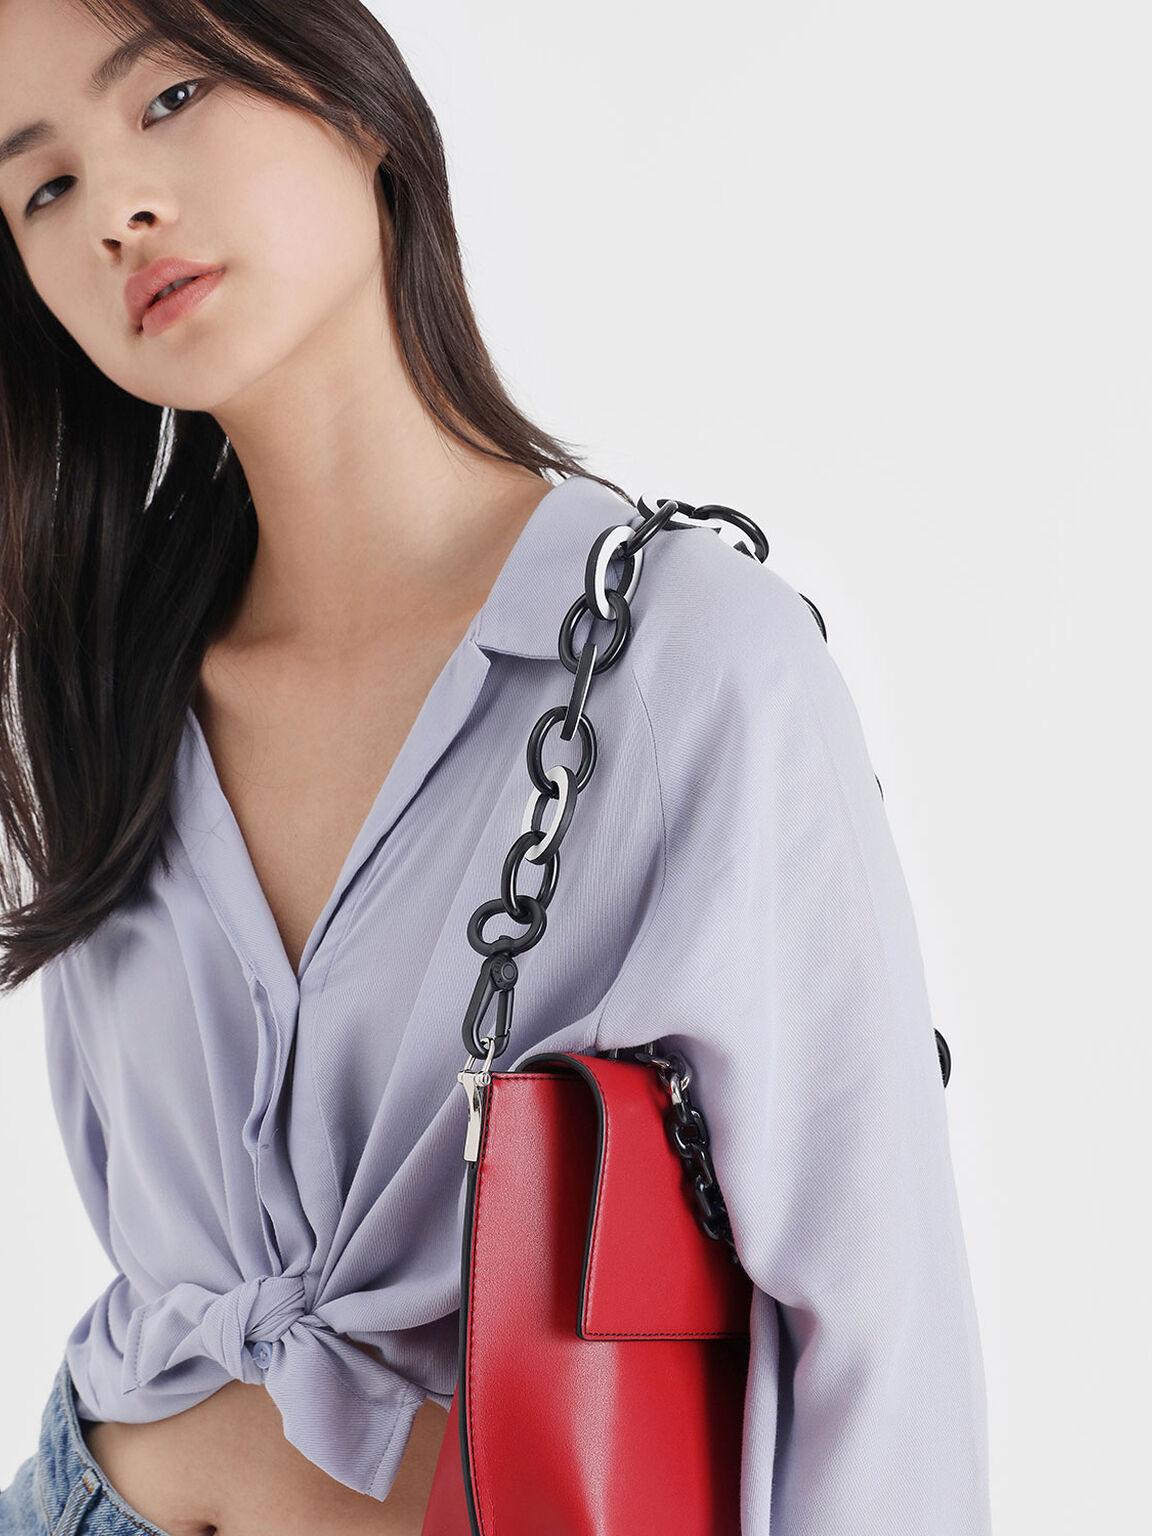 Two-Tone Chain Bag Strap, White, hi-res